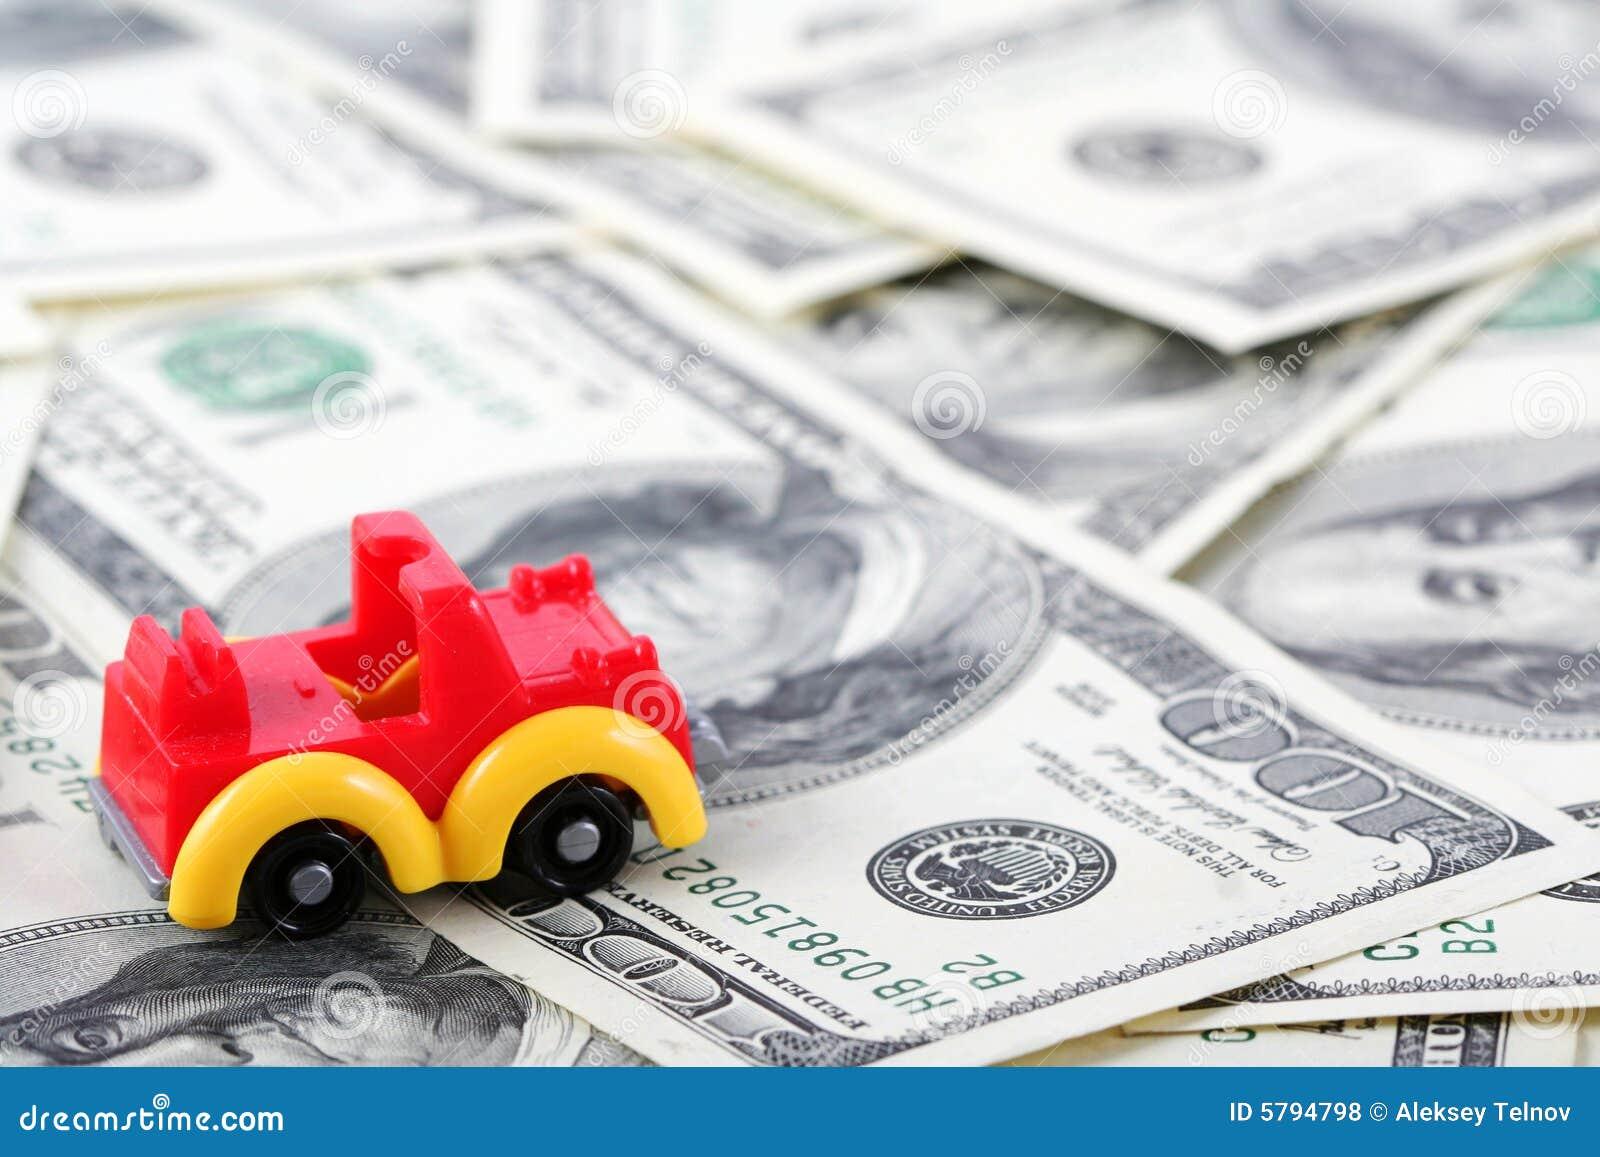 car on dollars royalty free stock photos image 5794798. Black Bedroom Furniture Sets. Home Design Ideas